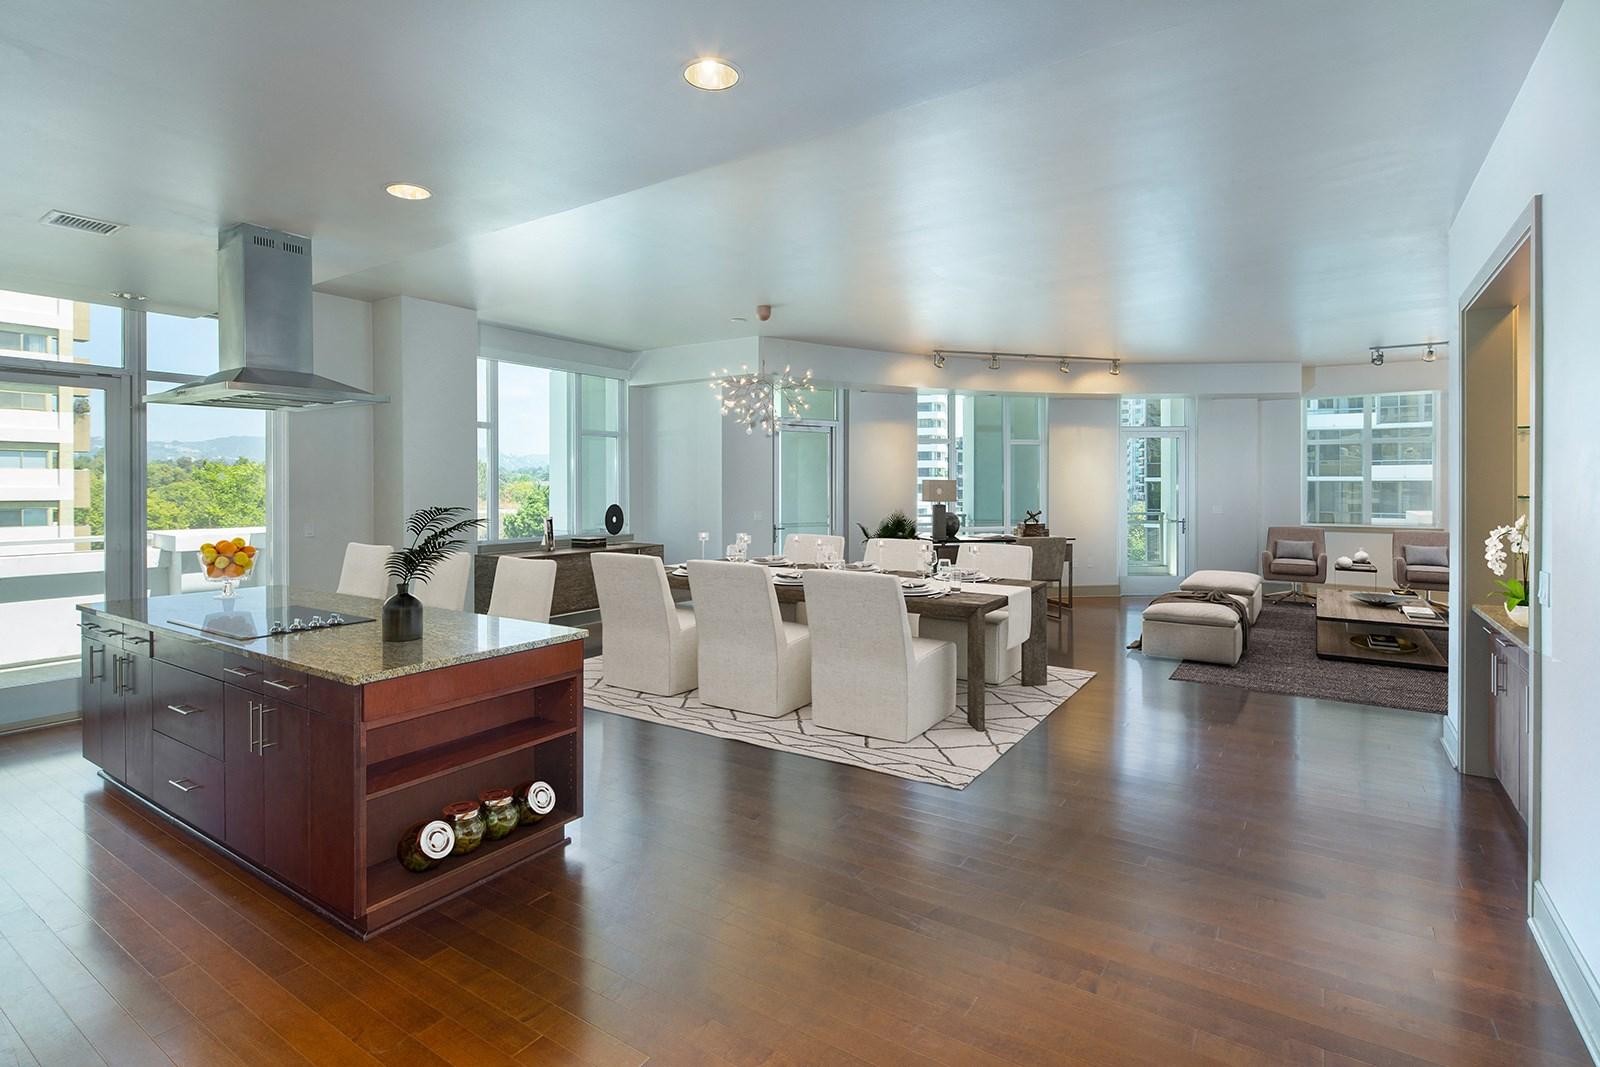 Los-Angeles-Furnished-Apartments-Wilshire-Victoria-2b-Lvrm2